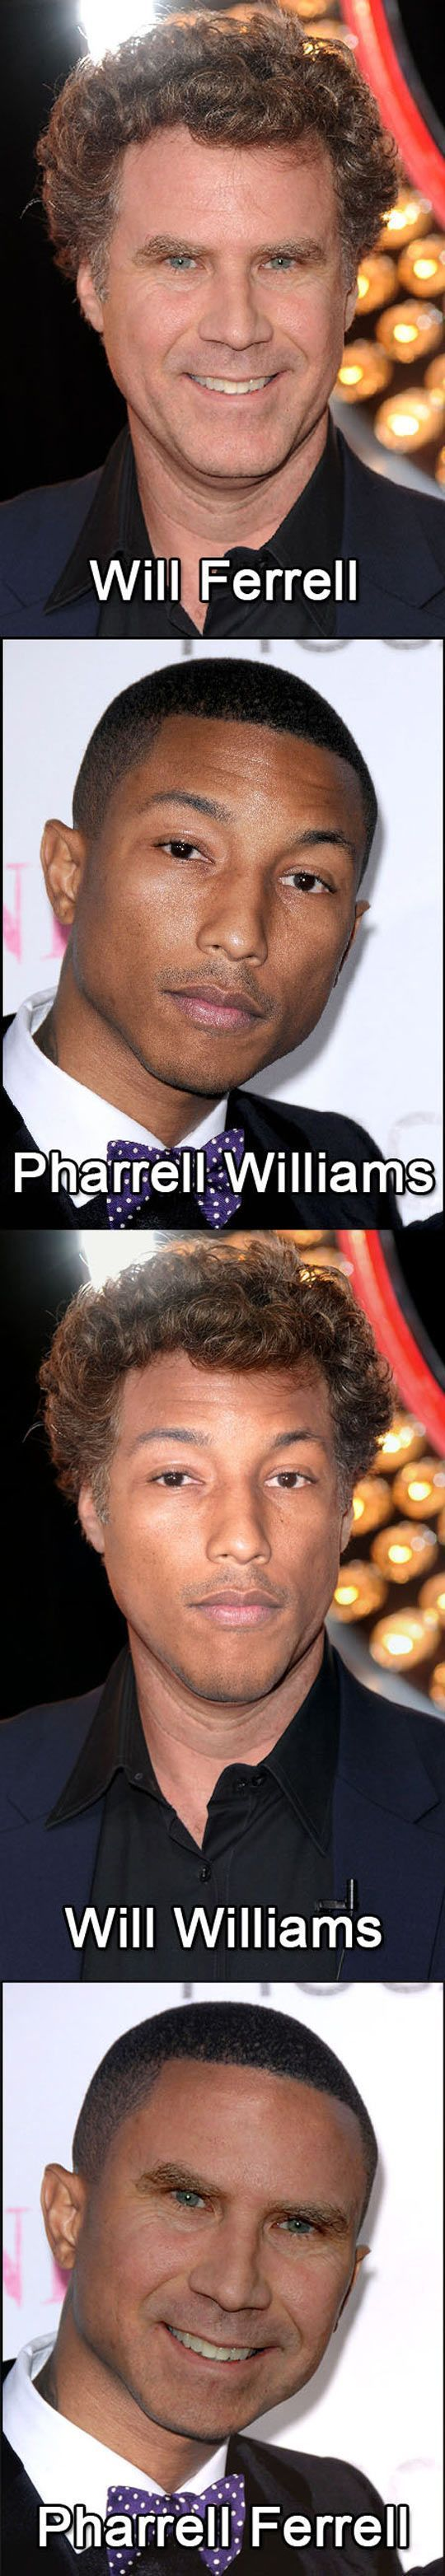 I laughed way to hard at this